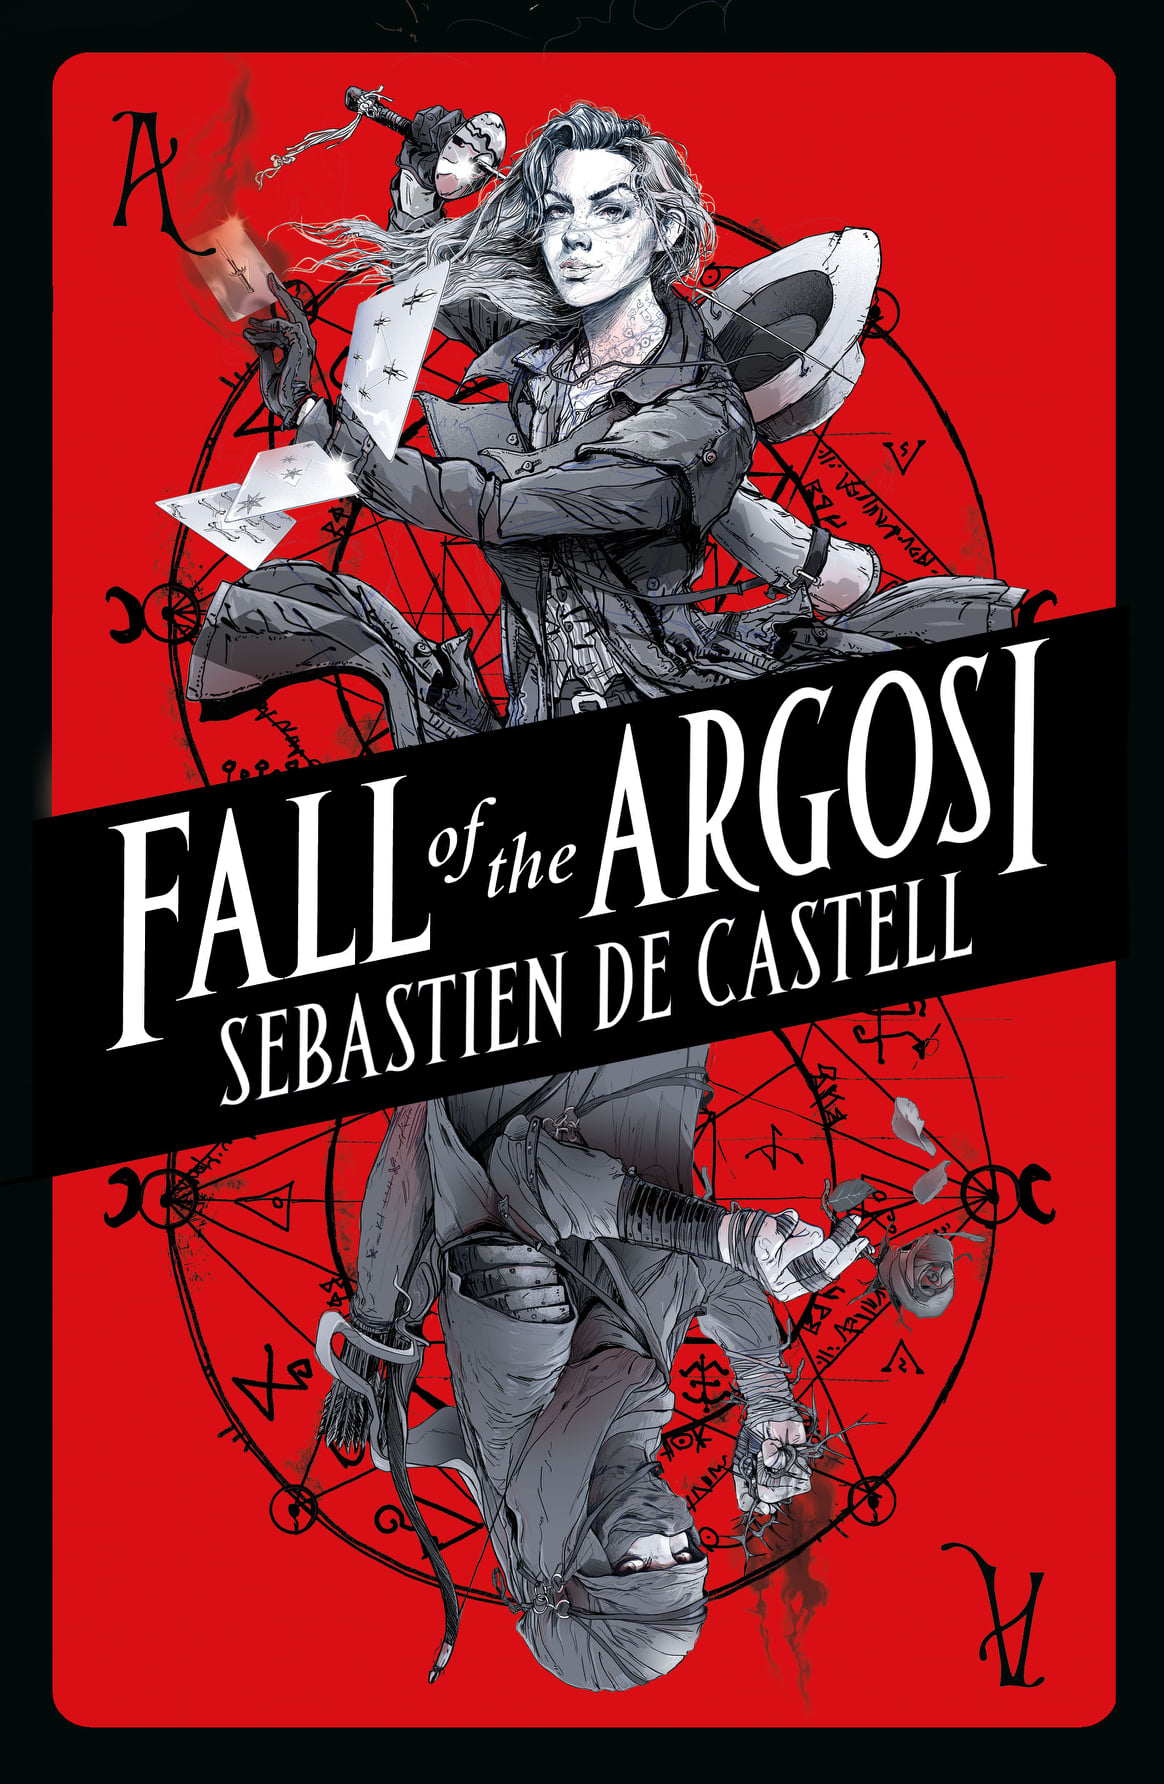 Fall of the Argosi by Sebastien de Castell